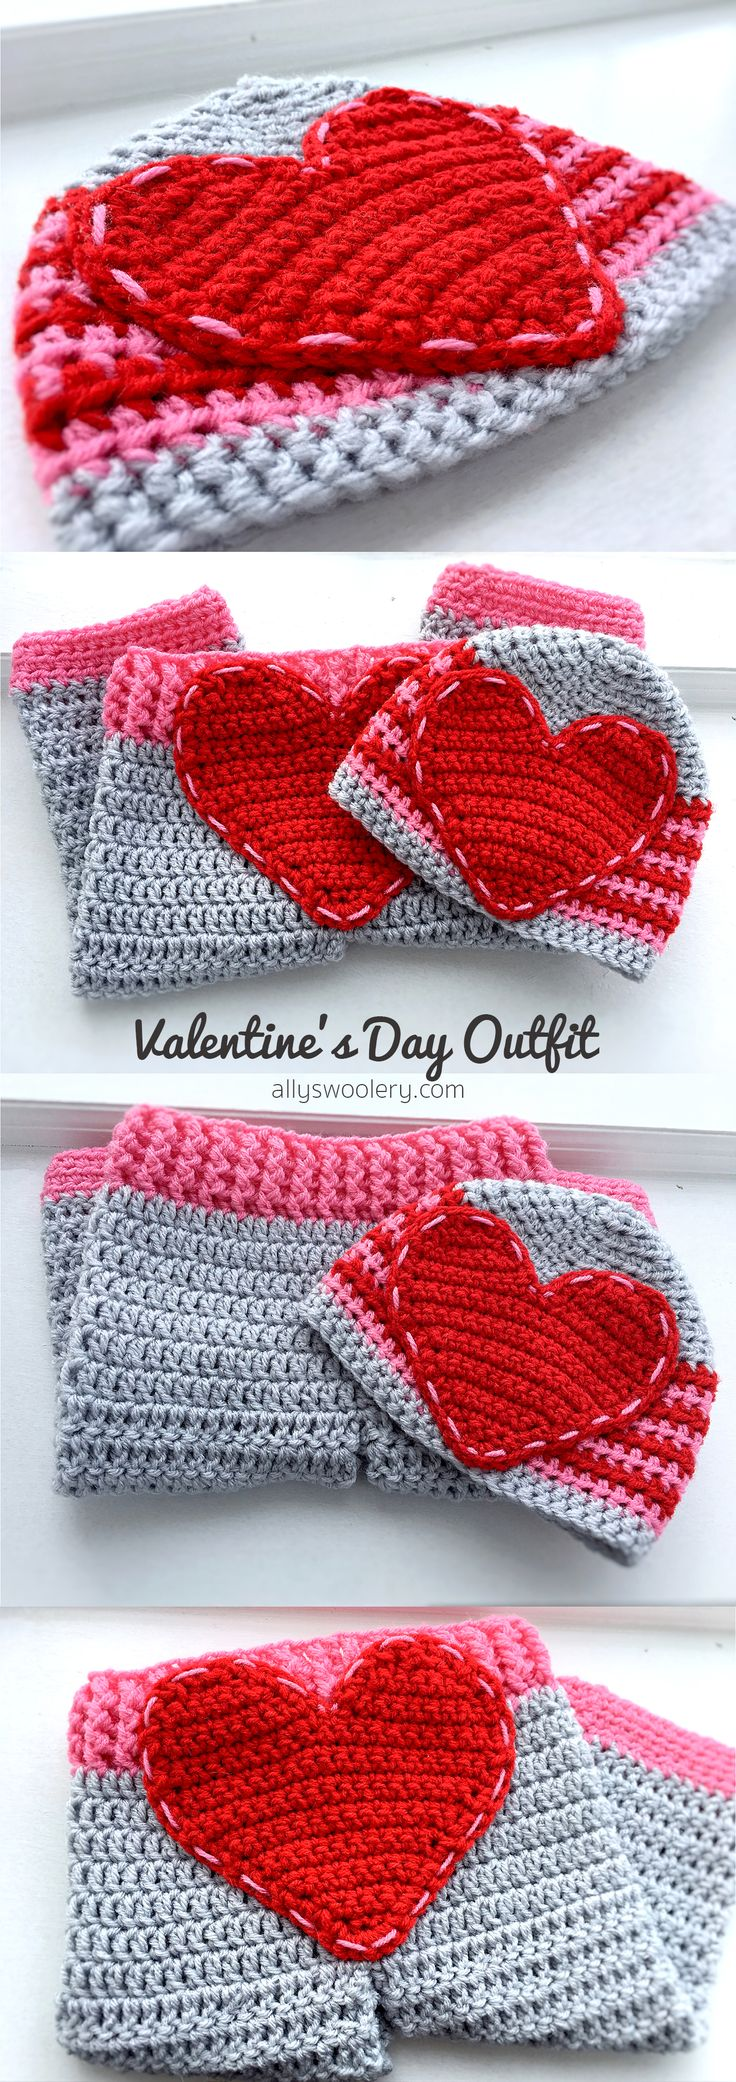 159 best Crochet Sets images on Pinterest | Newborn crochet ...